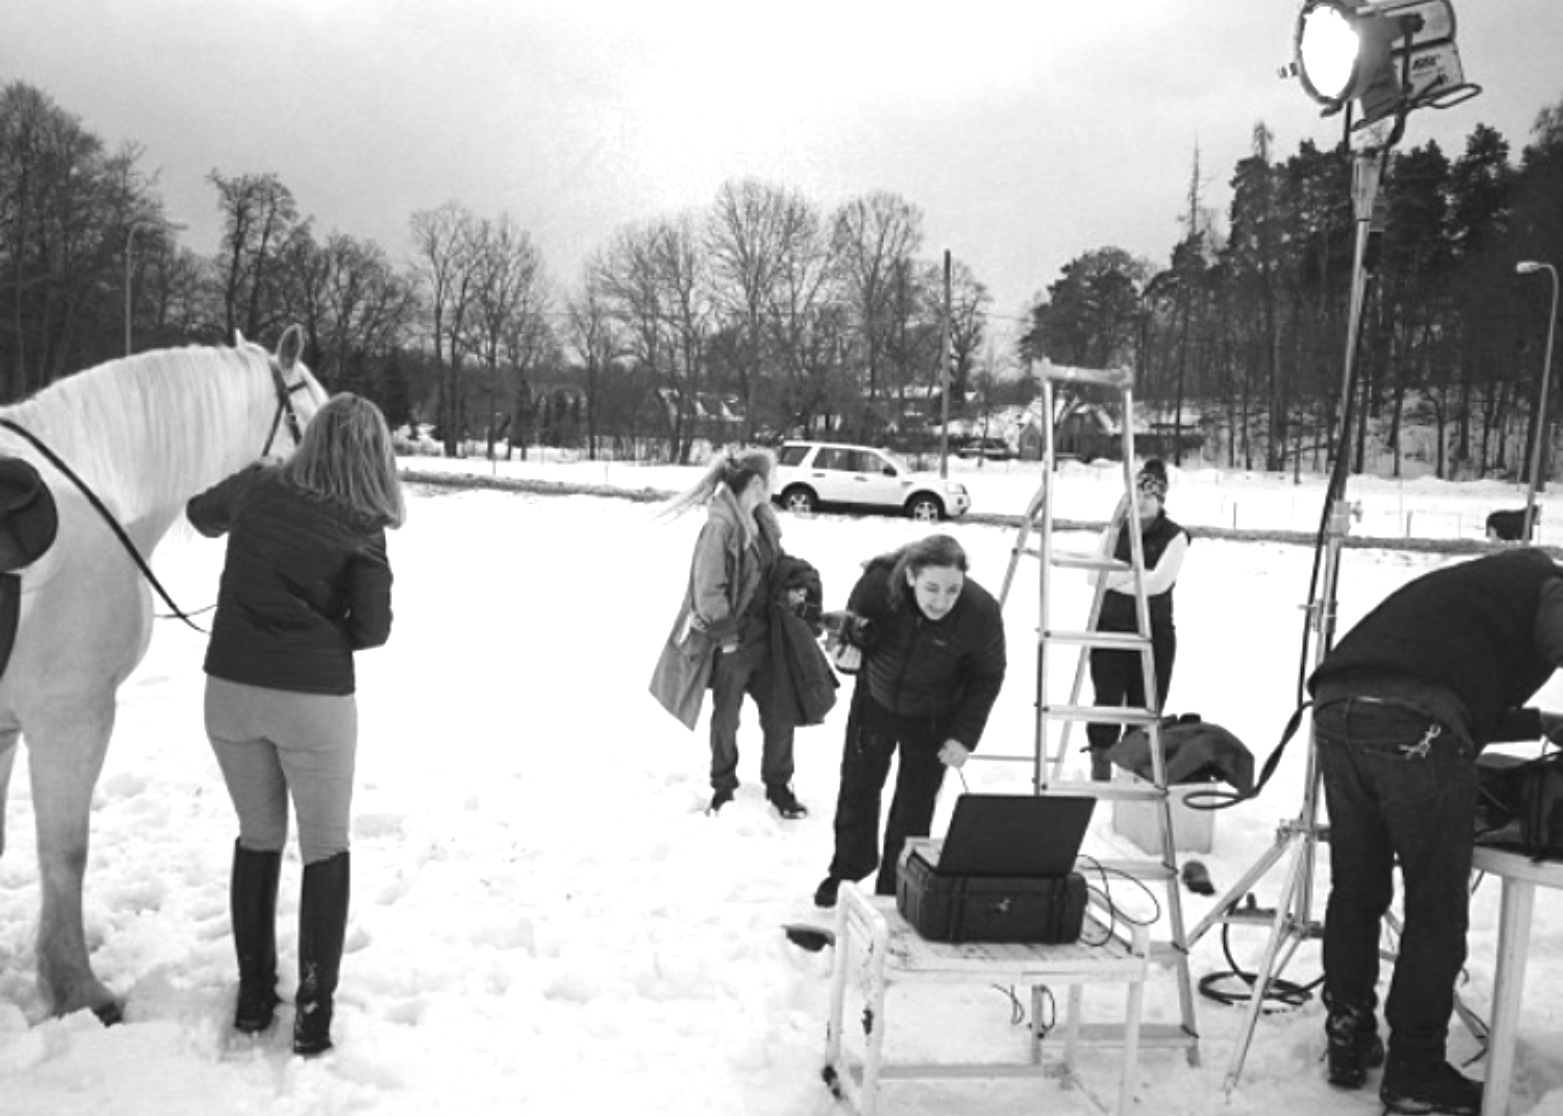 Carin Göthblad behind the scenessvv.jpg